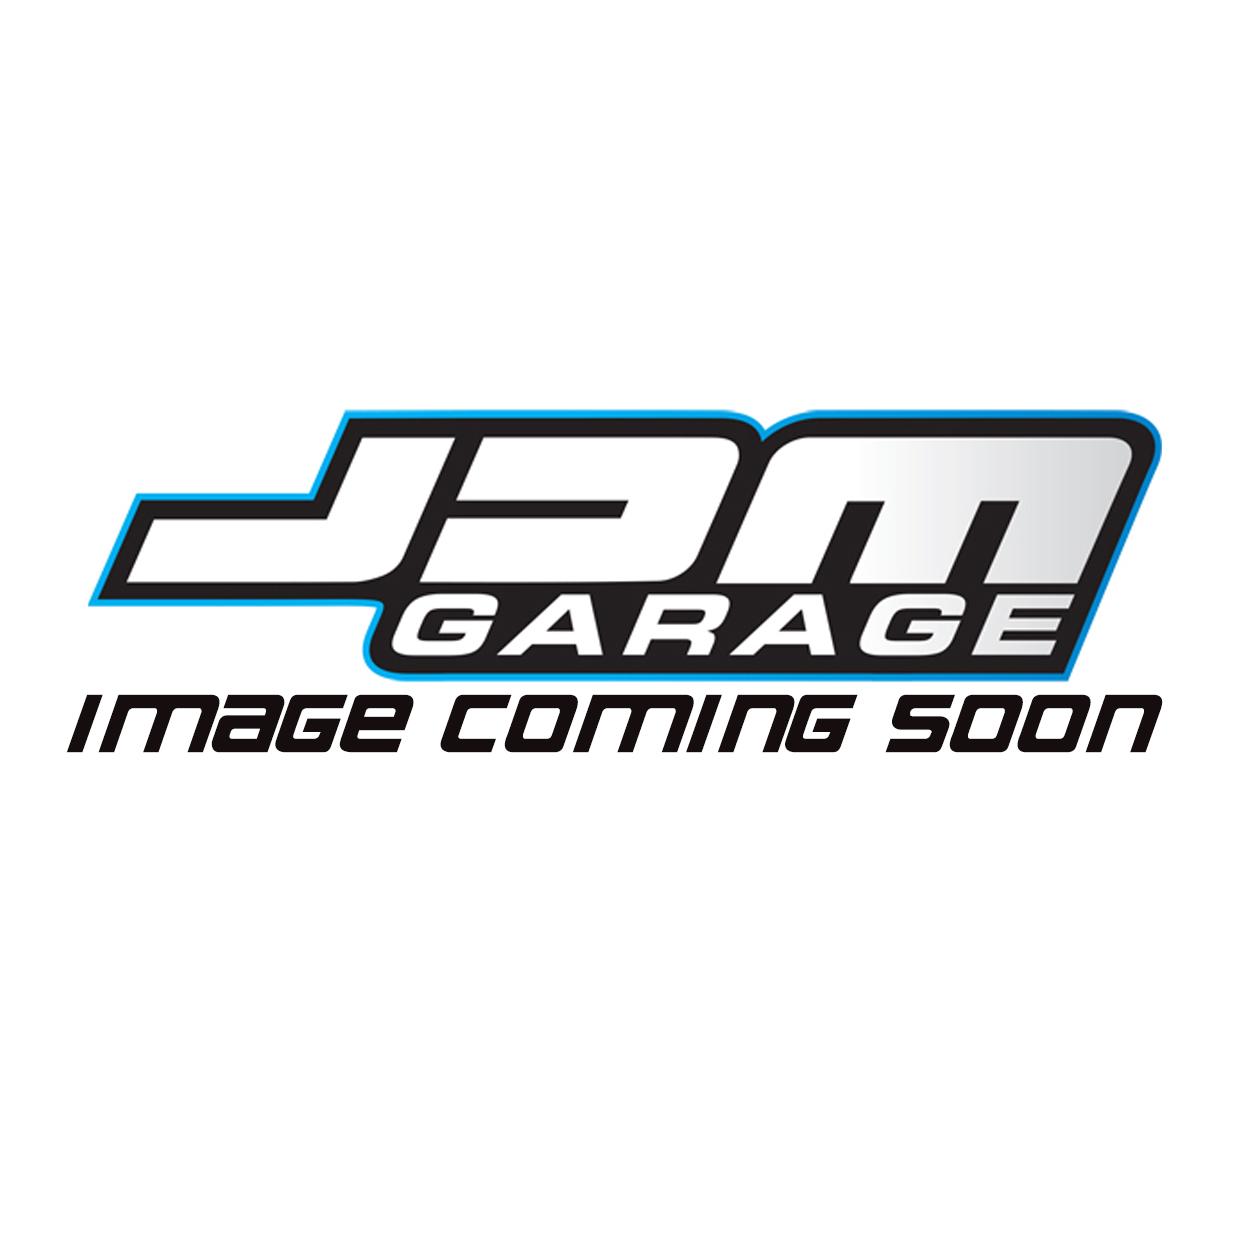 Ross Performance Bottom Pulley Metal Jacket Non-Triggered Harmonic Damper Fits Nissan S14 200SX / S15 SR20DET